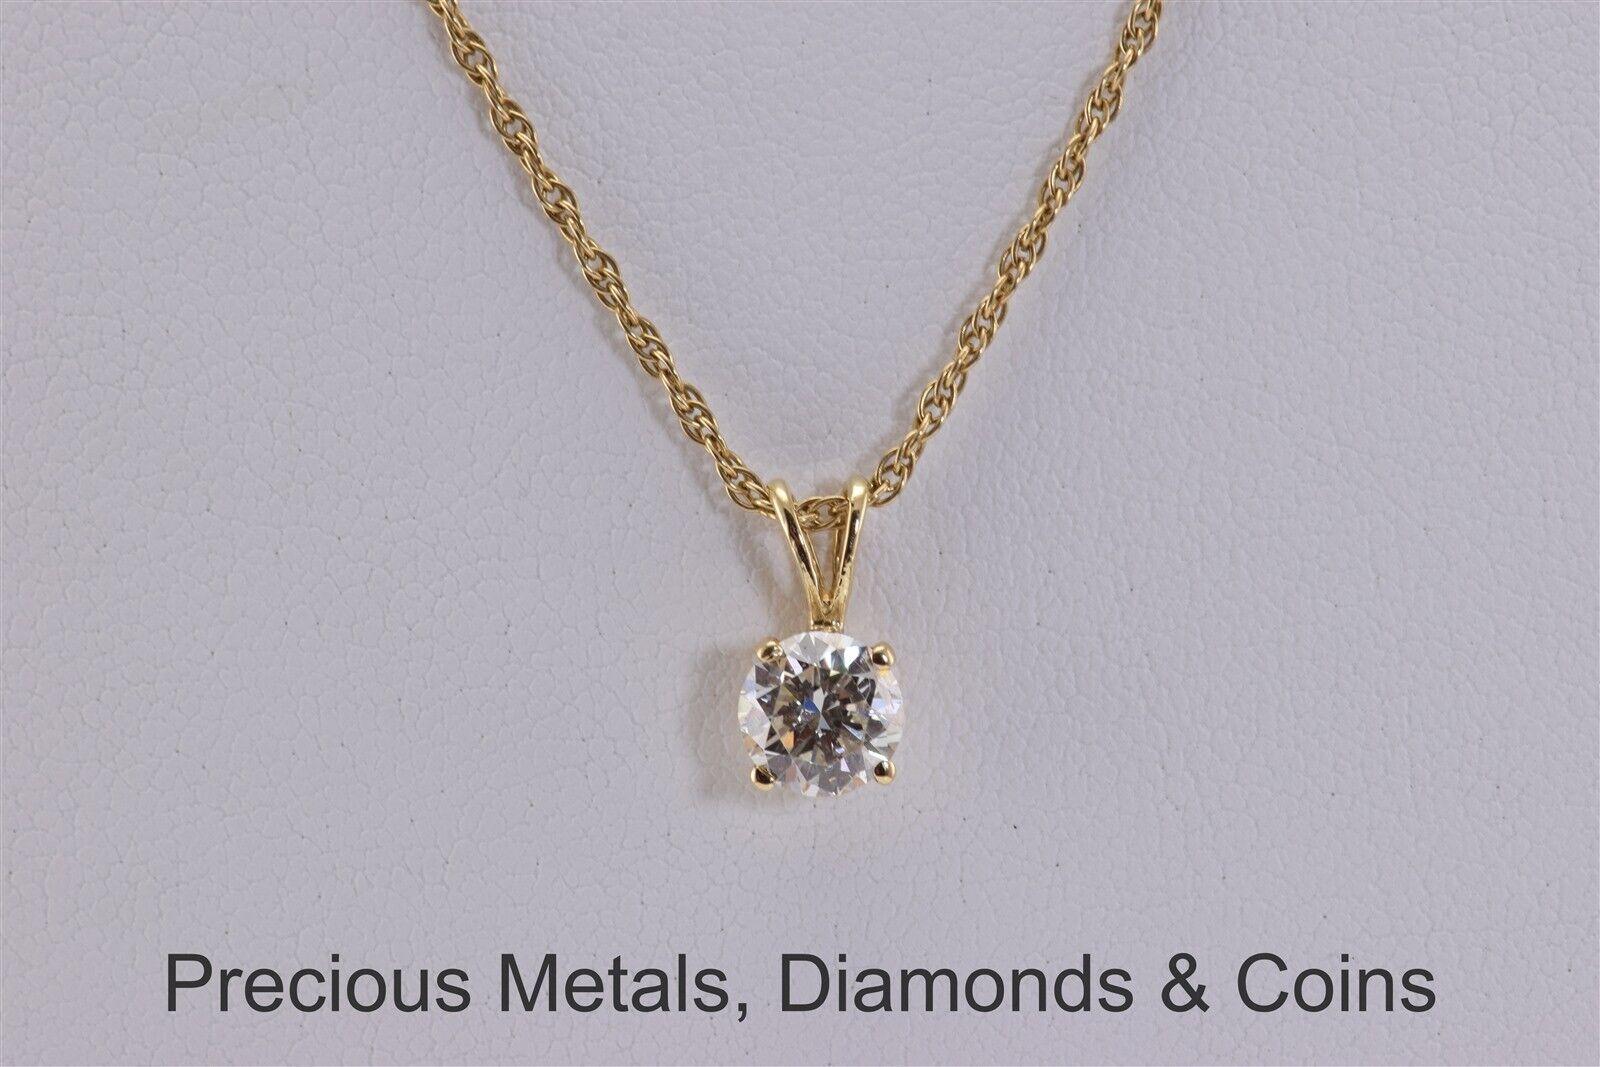 14k Yellow gold 12mm x 6mm .90ct Diamond Solitaire Pendant 18.5  Chain